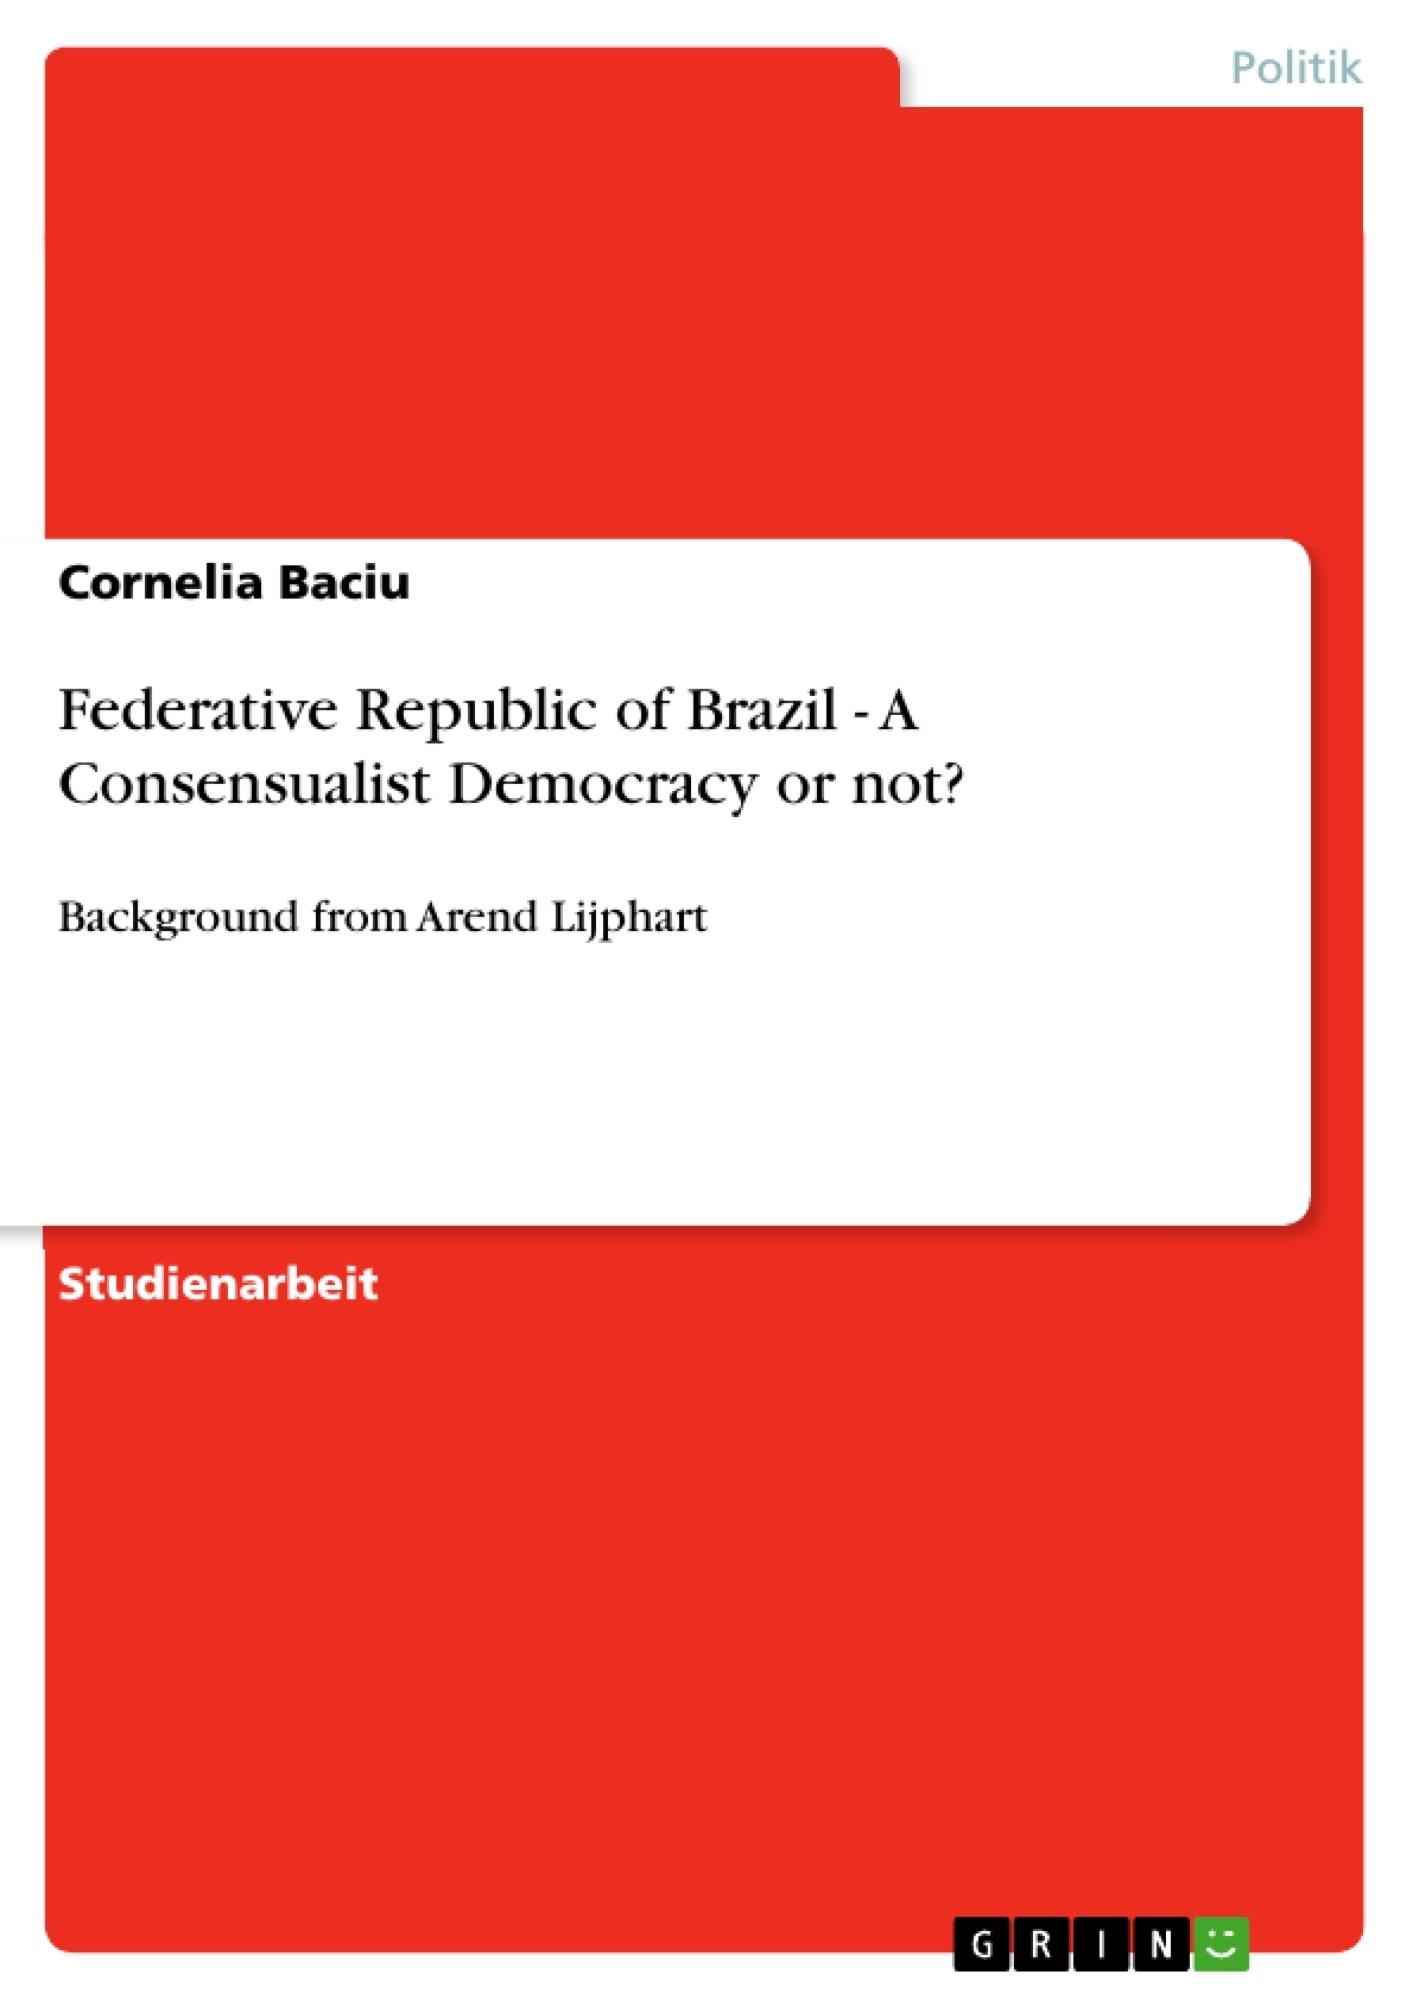 Titel: Federative Republic of Brazil - A Consensualist Democracy or not?